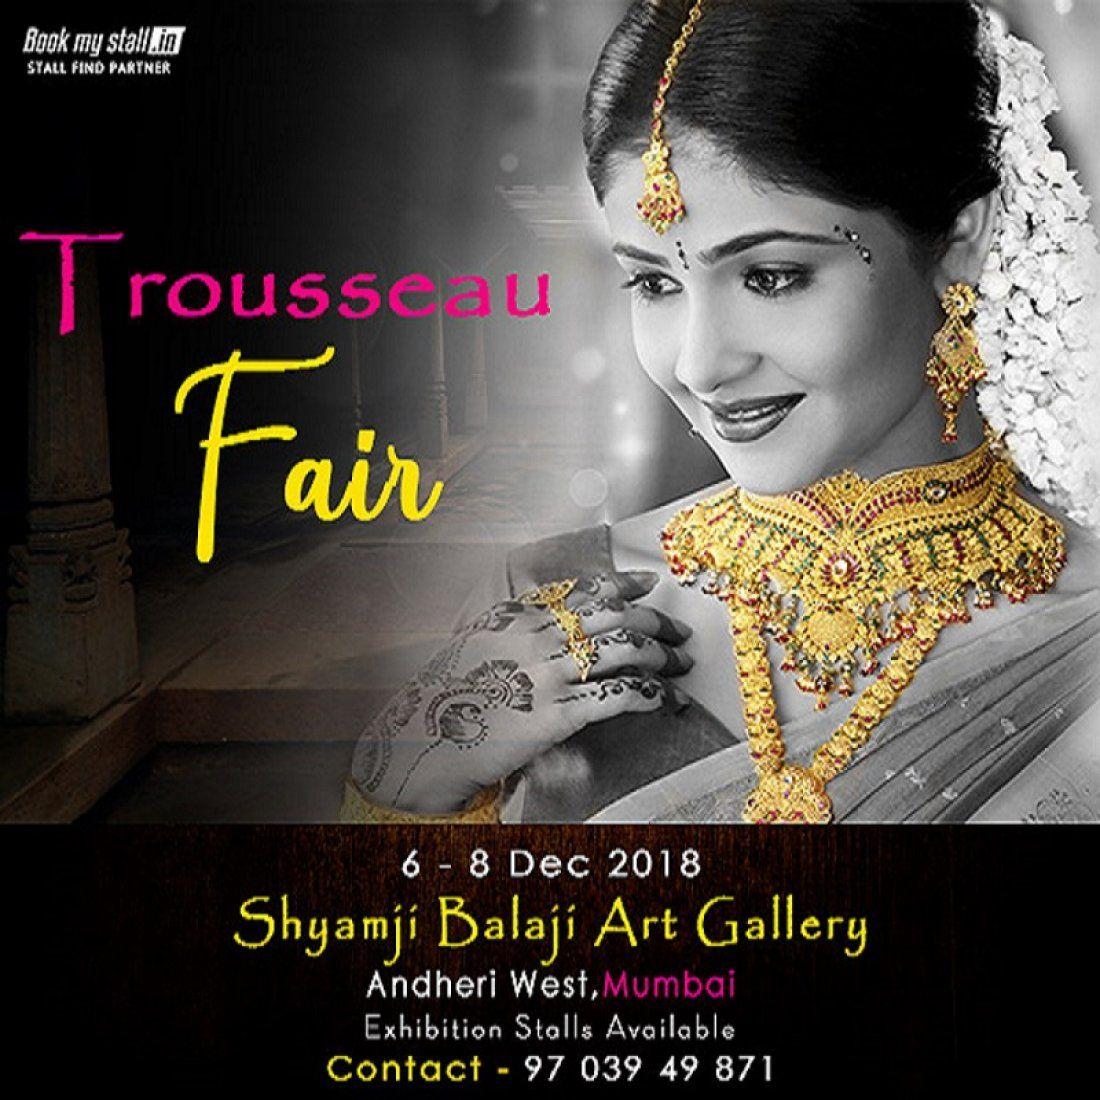 Trousseau Fair Lifestyle Expo  Mumbai - BookMyStall